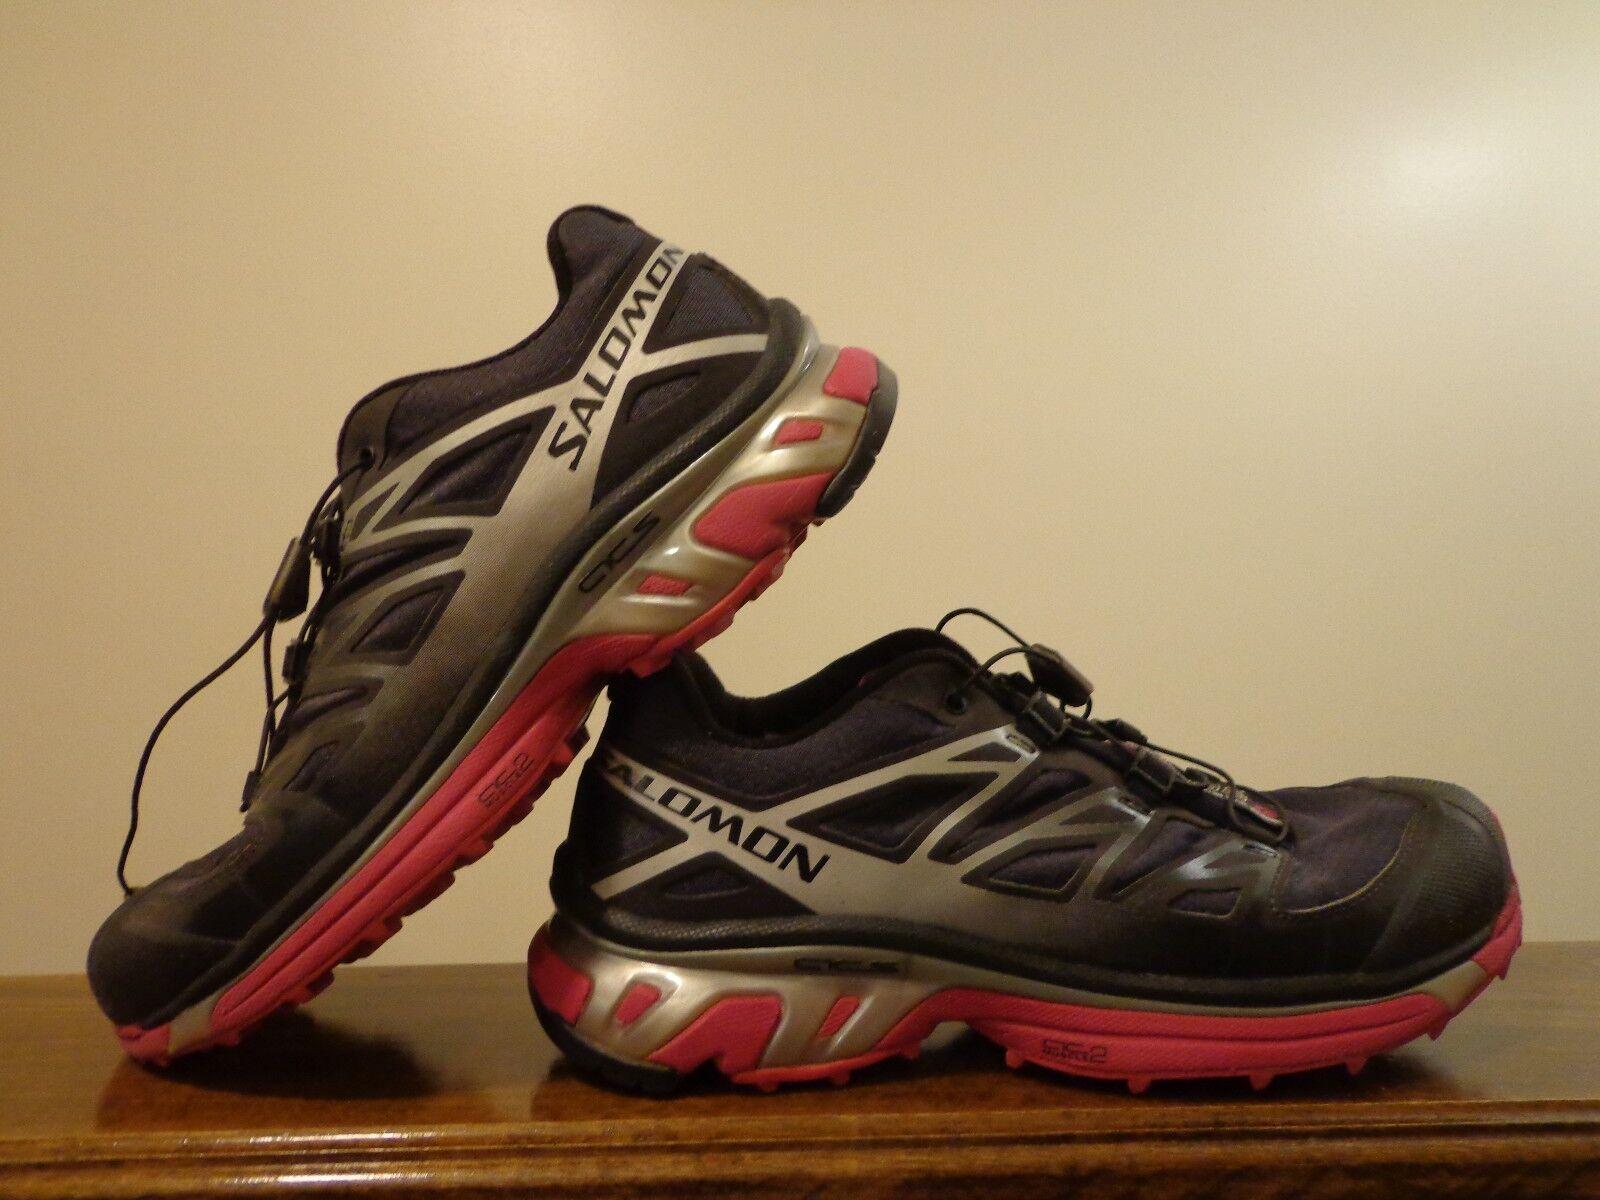 Salomon Ortholite XT Wings-3 Contagrip High Traction Rubber Women's shoes Size 7